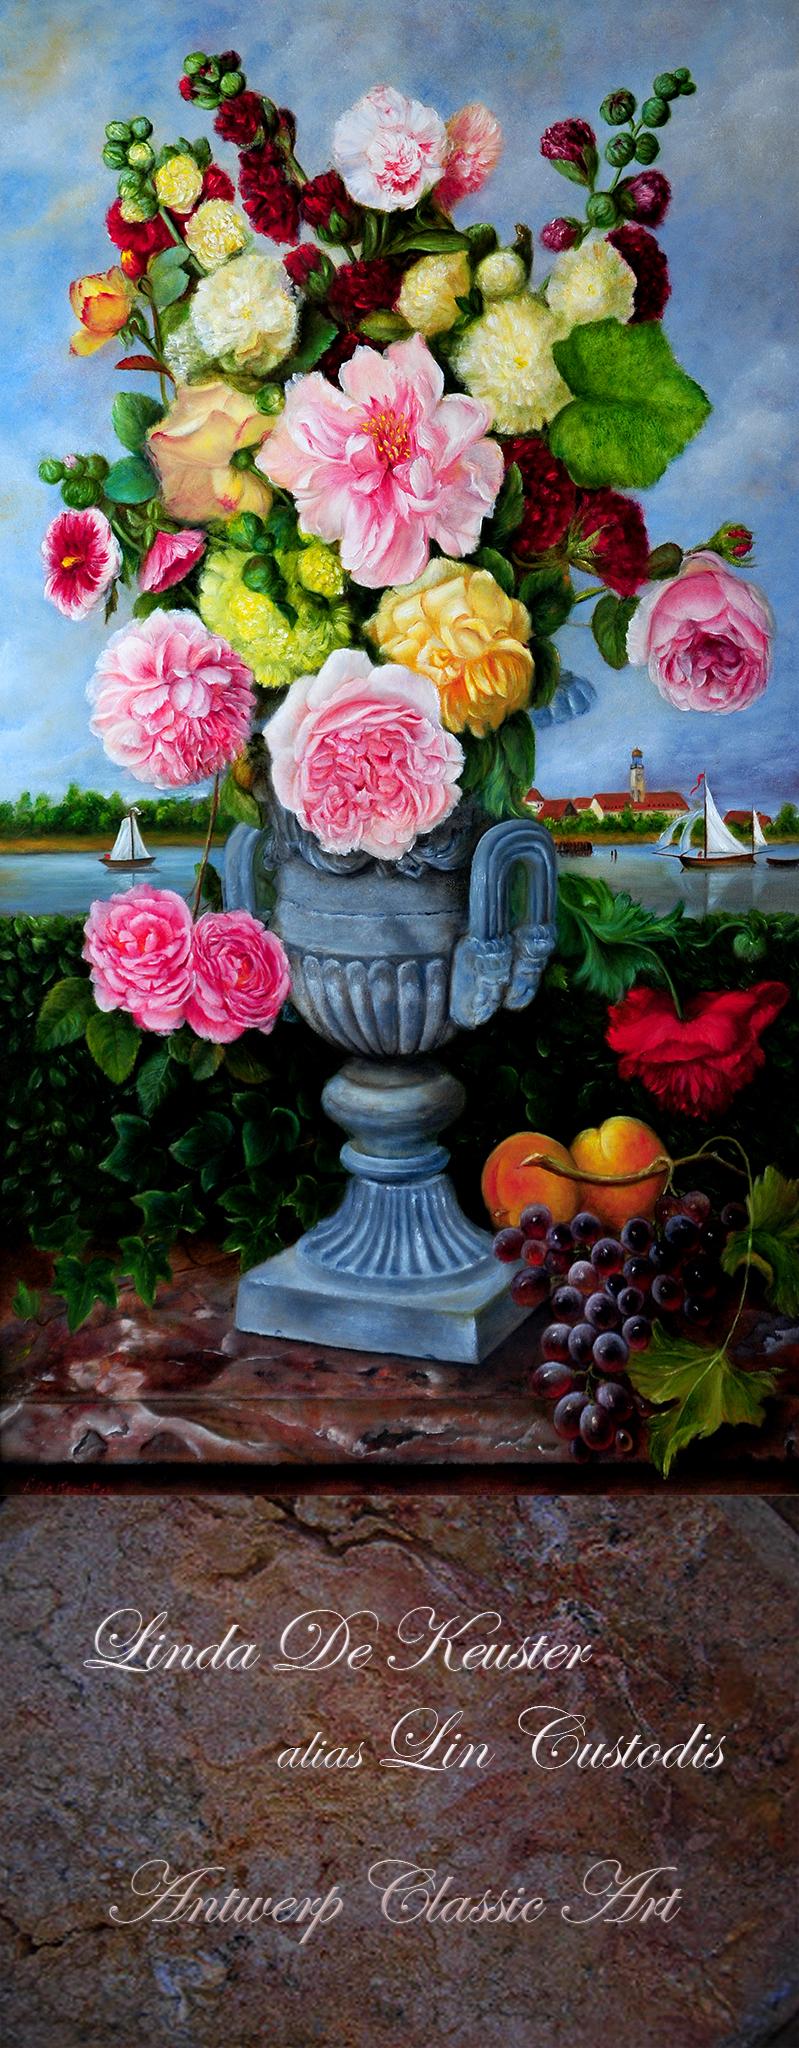 Banner tentoonstelling Flowers marmer okkklein